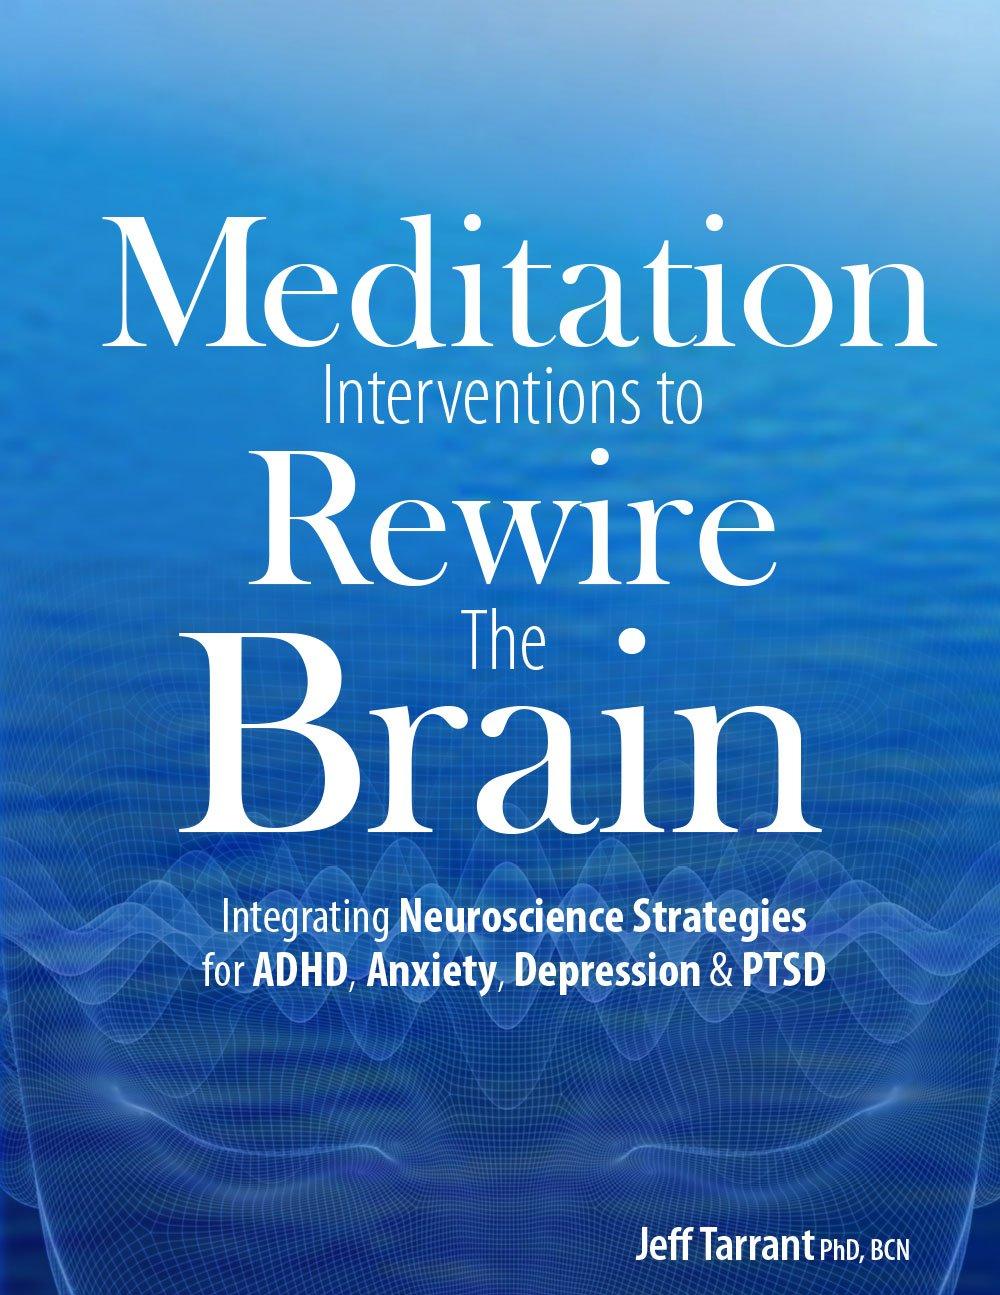 Meditation Interventions Rewire Brain Neuroscience product image